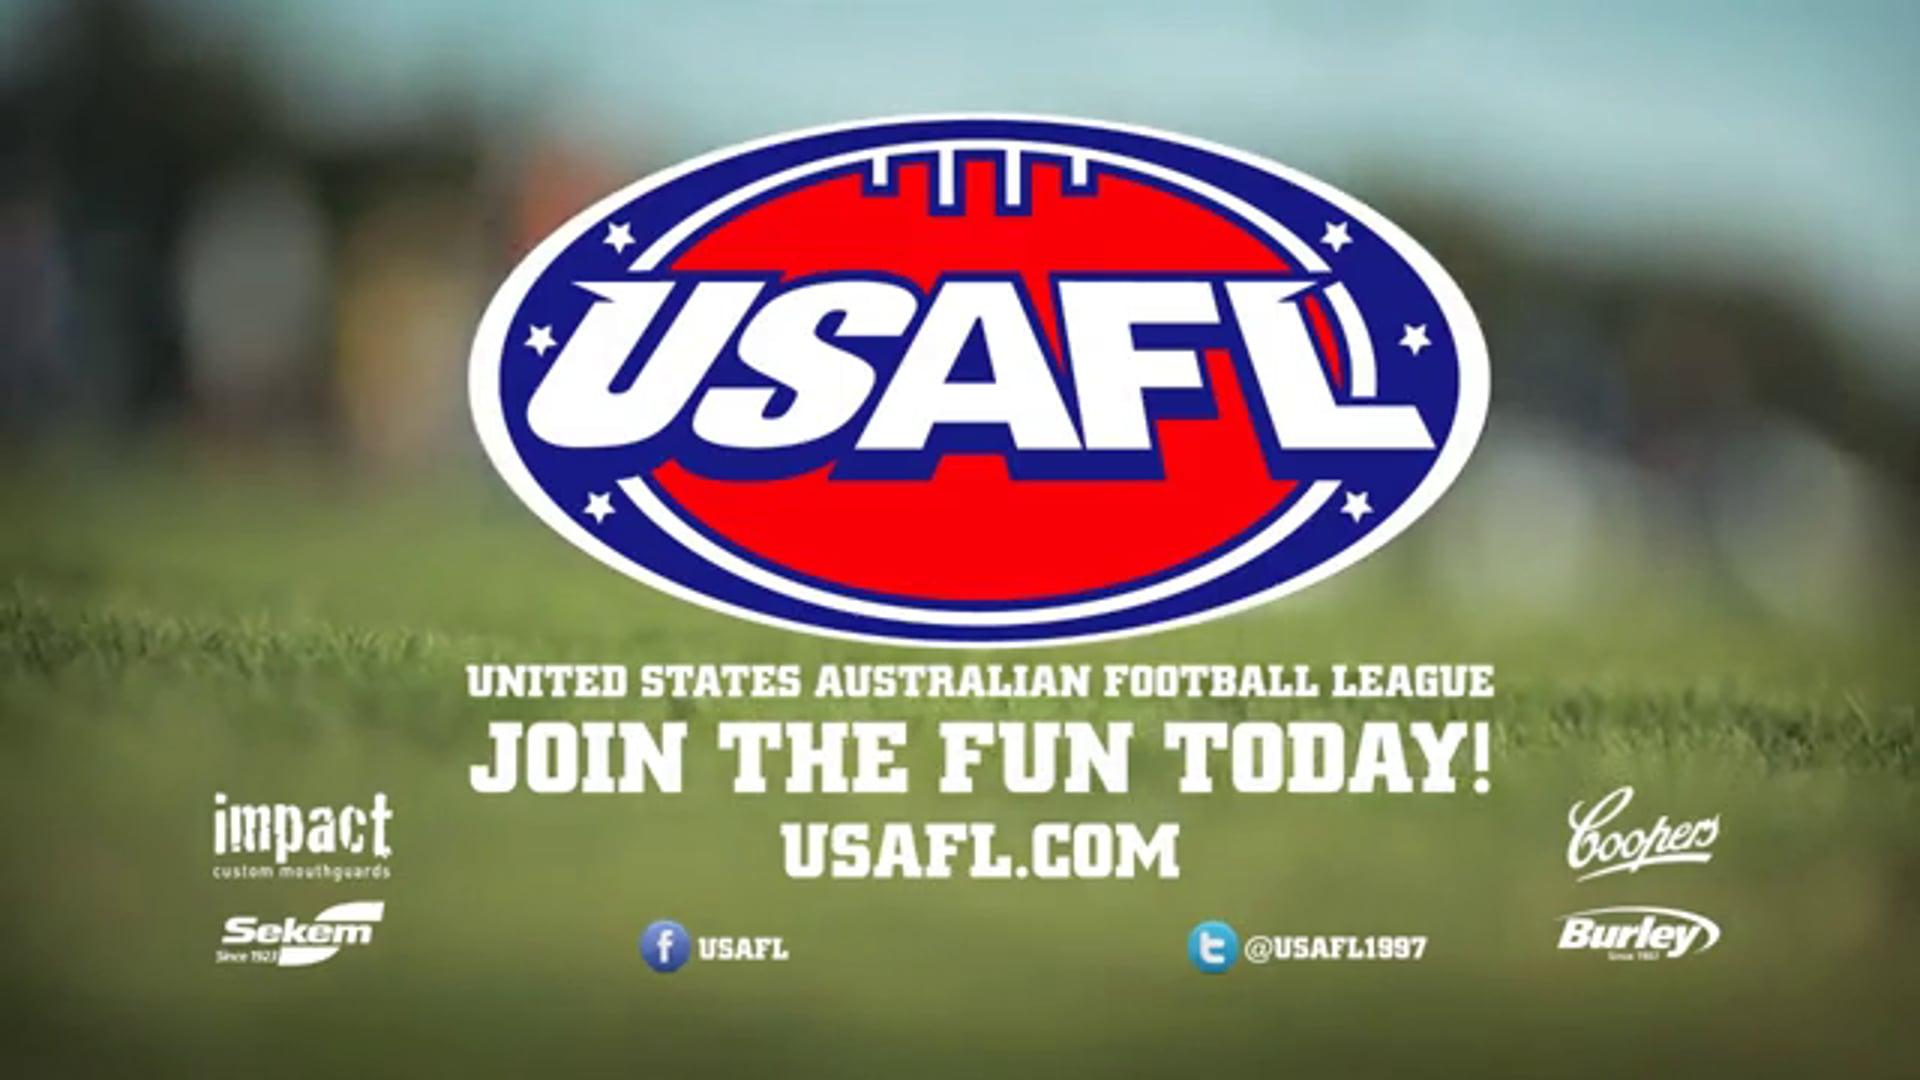 Join the Fun - USAFL